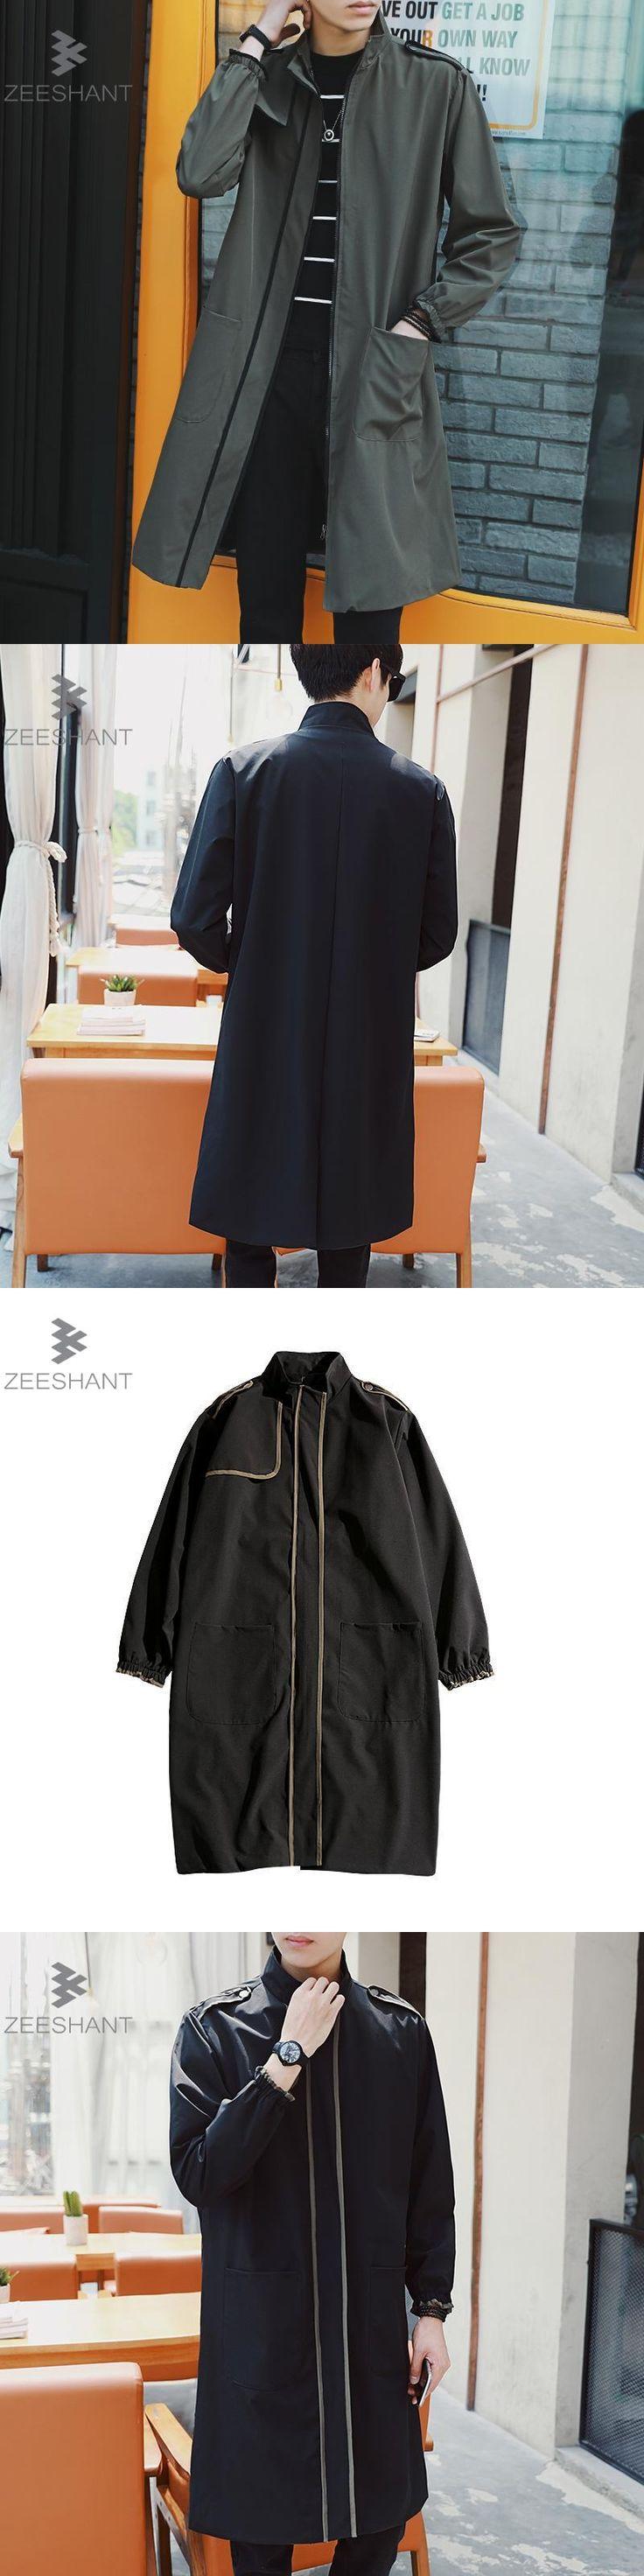 Zeeshant Outerwear Men's Army Green Coats Zipper Men Streetwear Jackets Men Clothing Fashion Coats in Men's Trench XXXL